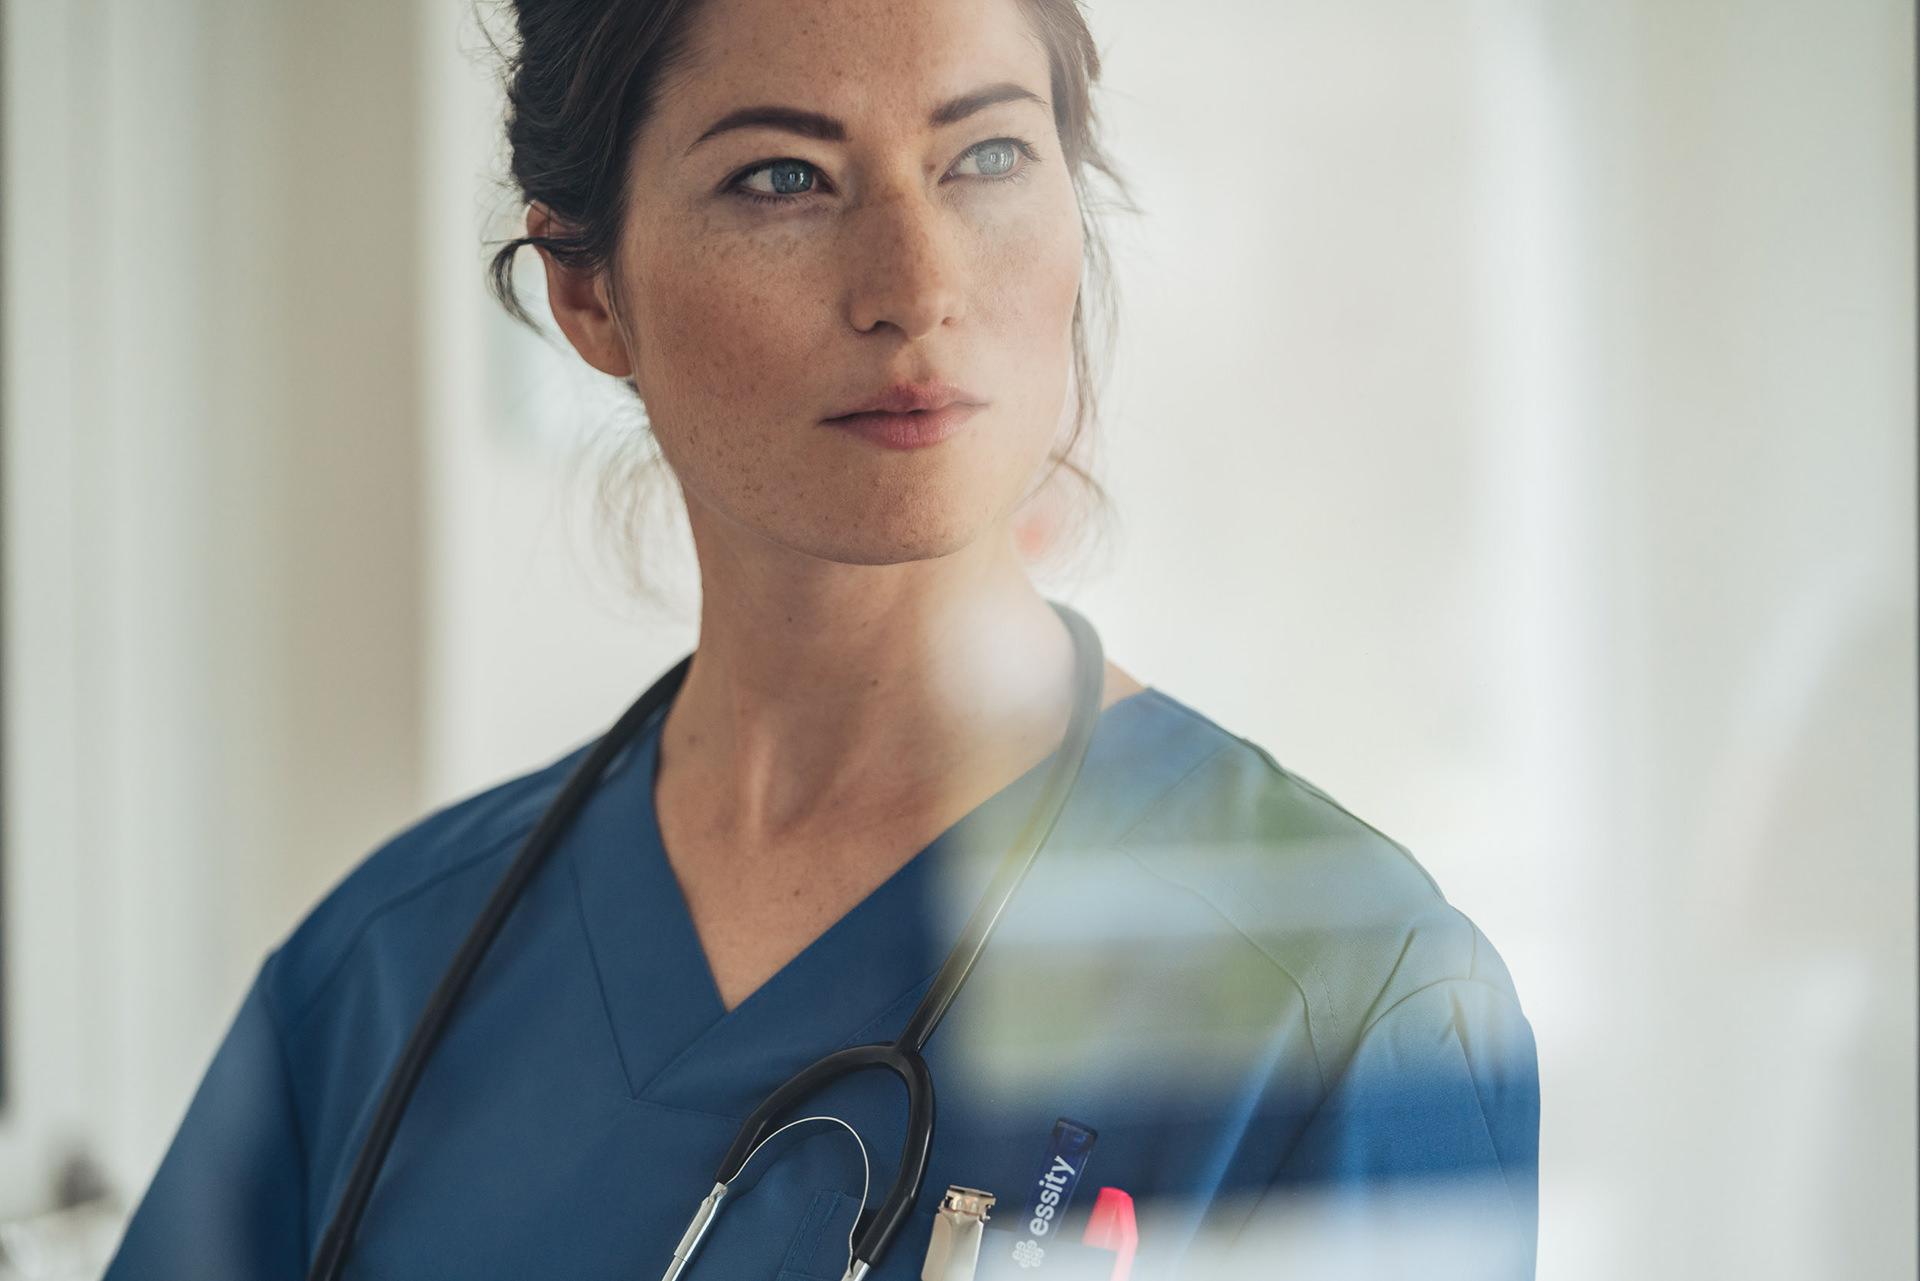 krankenschwester-portrait-krankenhaus-medizin